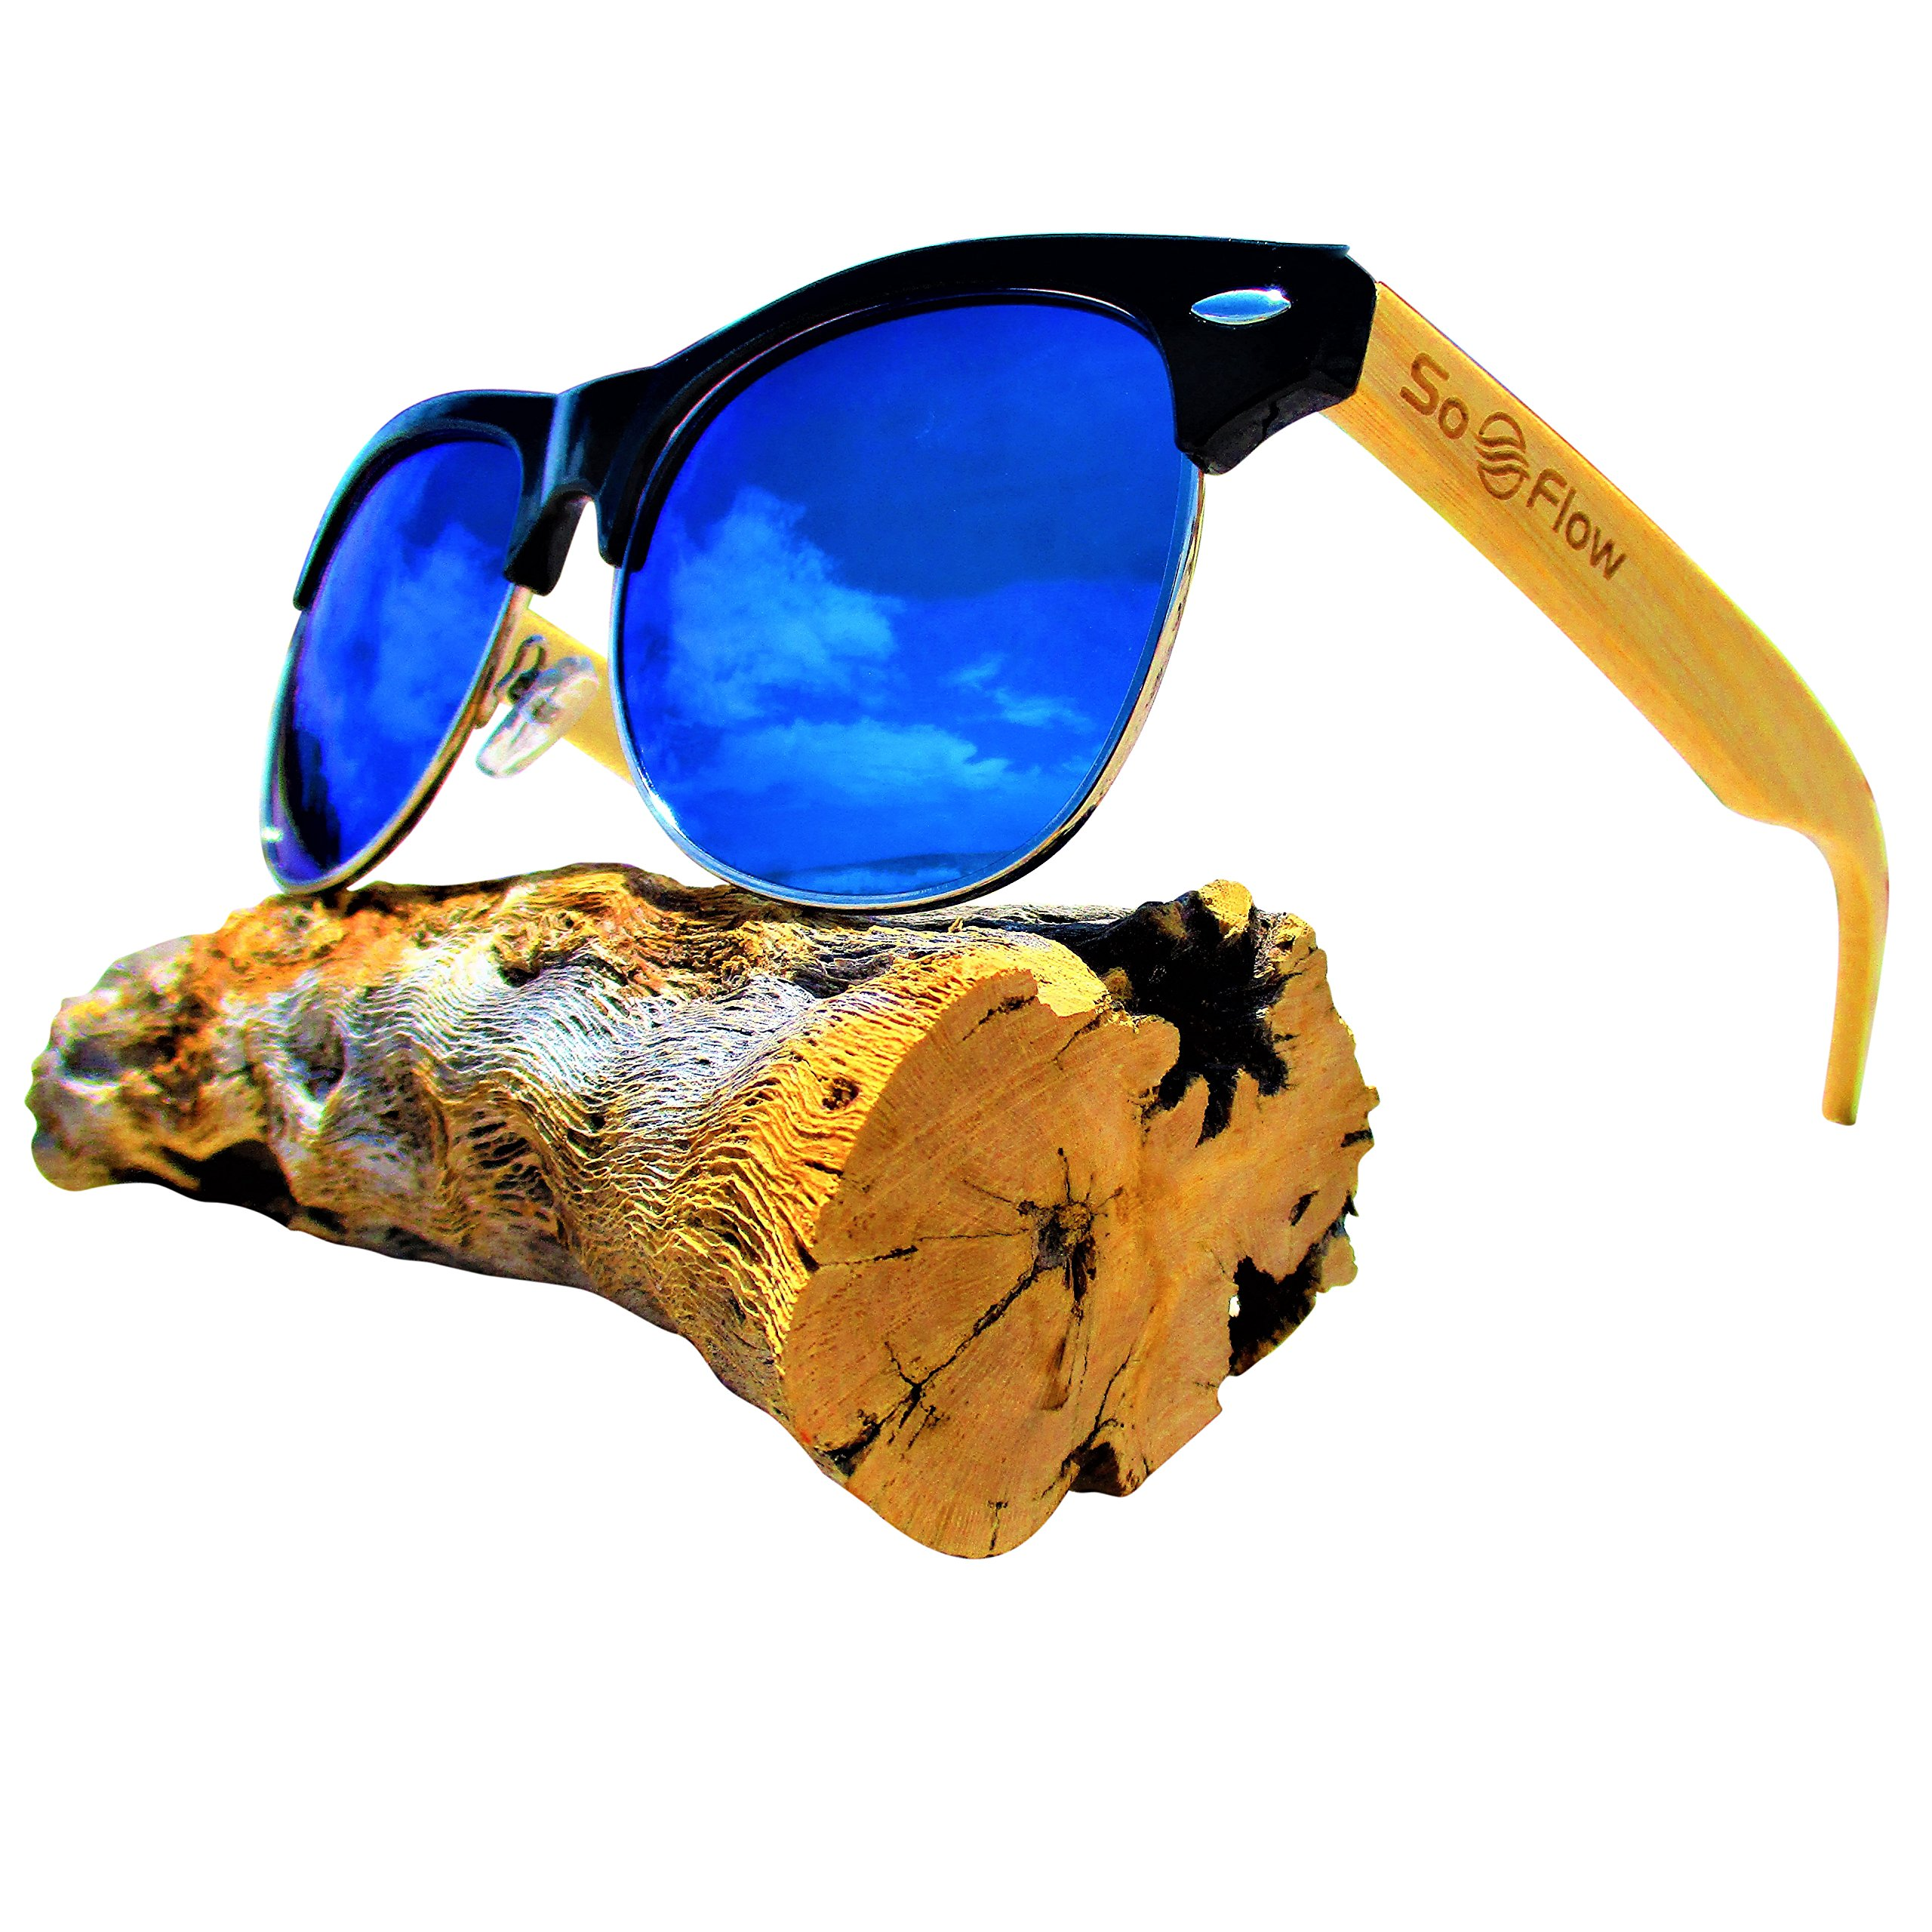 Blue Mirror Polarized Bamboo Wood Sunglasses Semi Rimless/Half Frame - Wooden